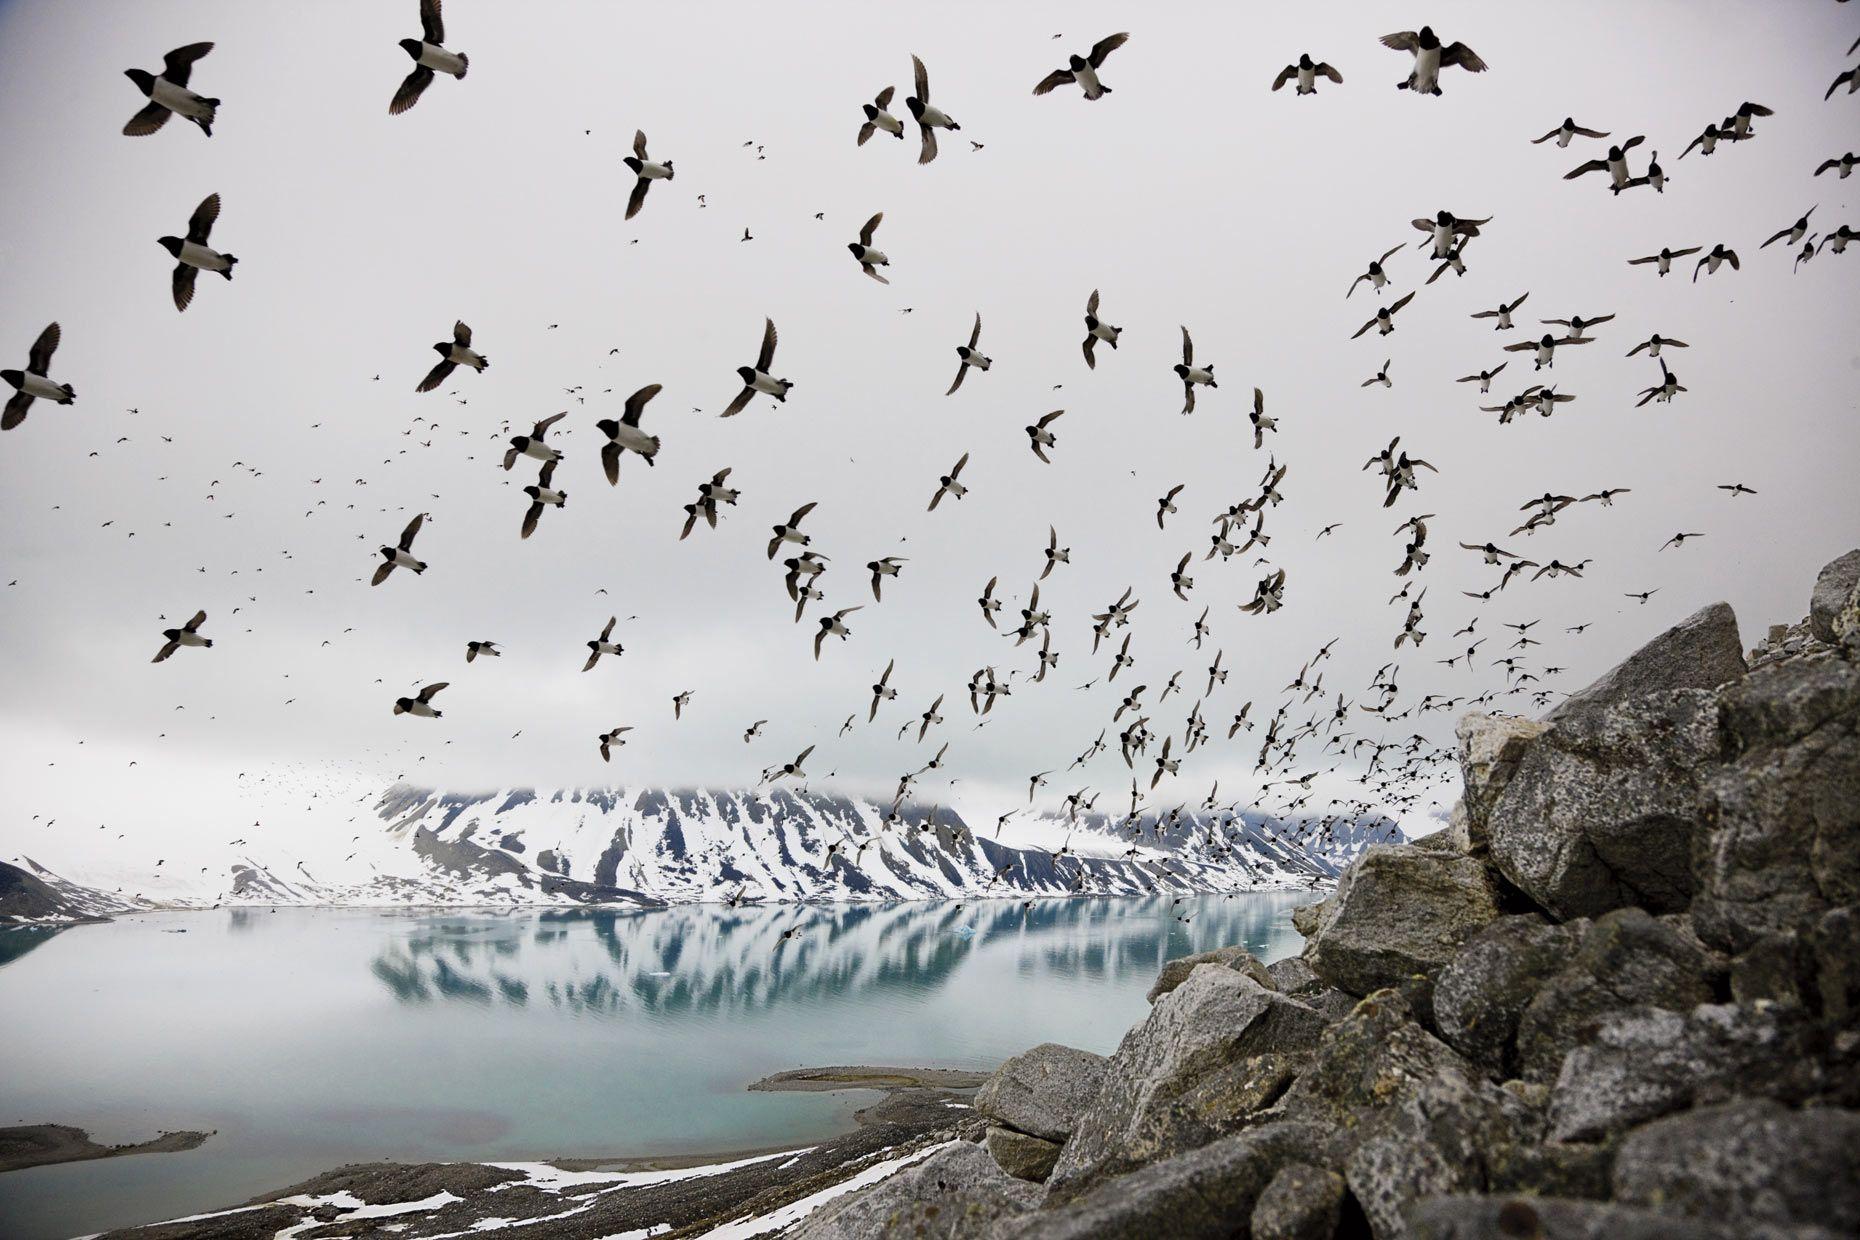 Photographer Paul Nicklen